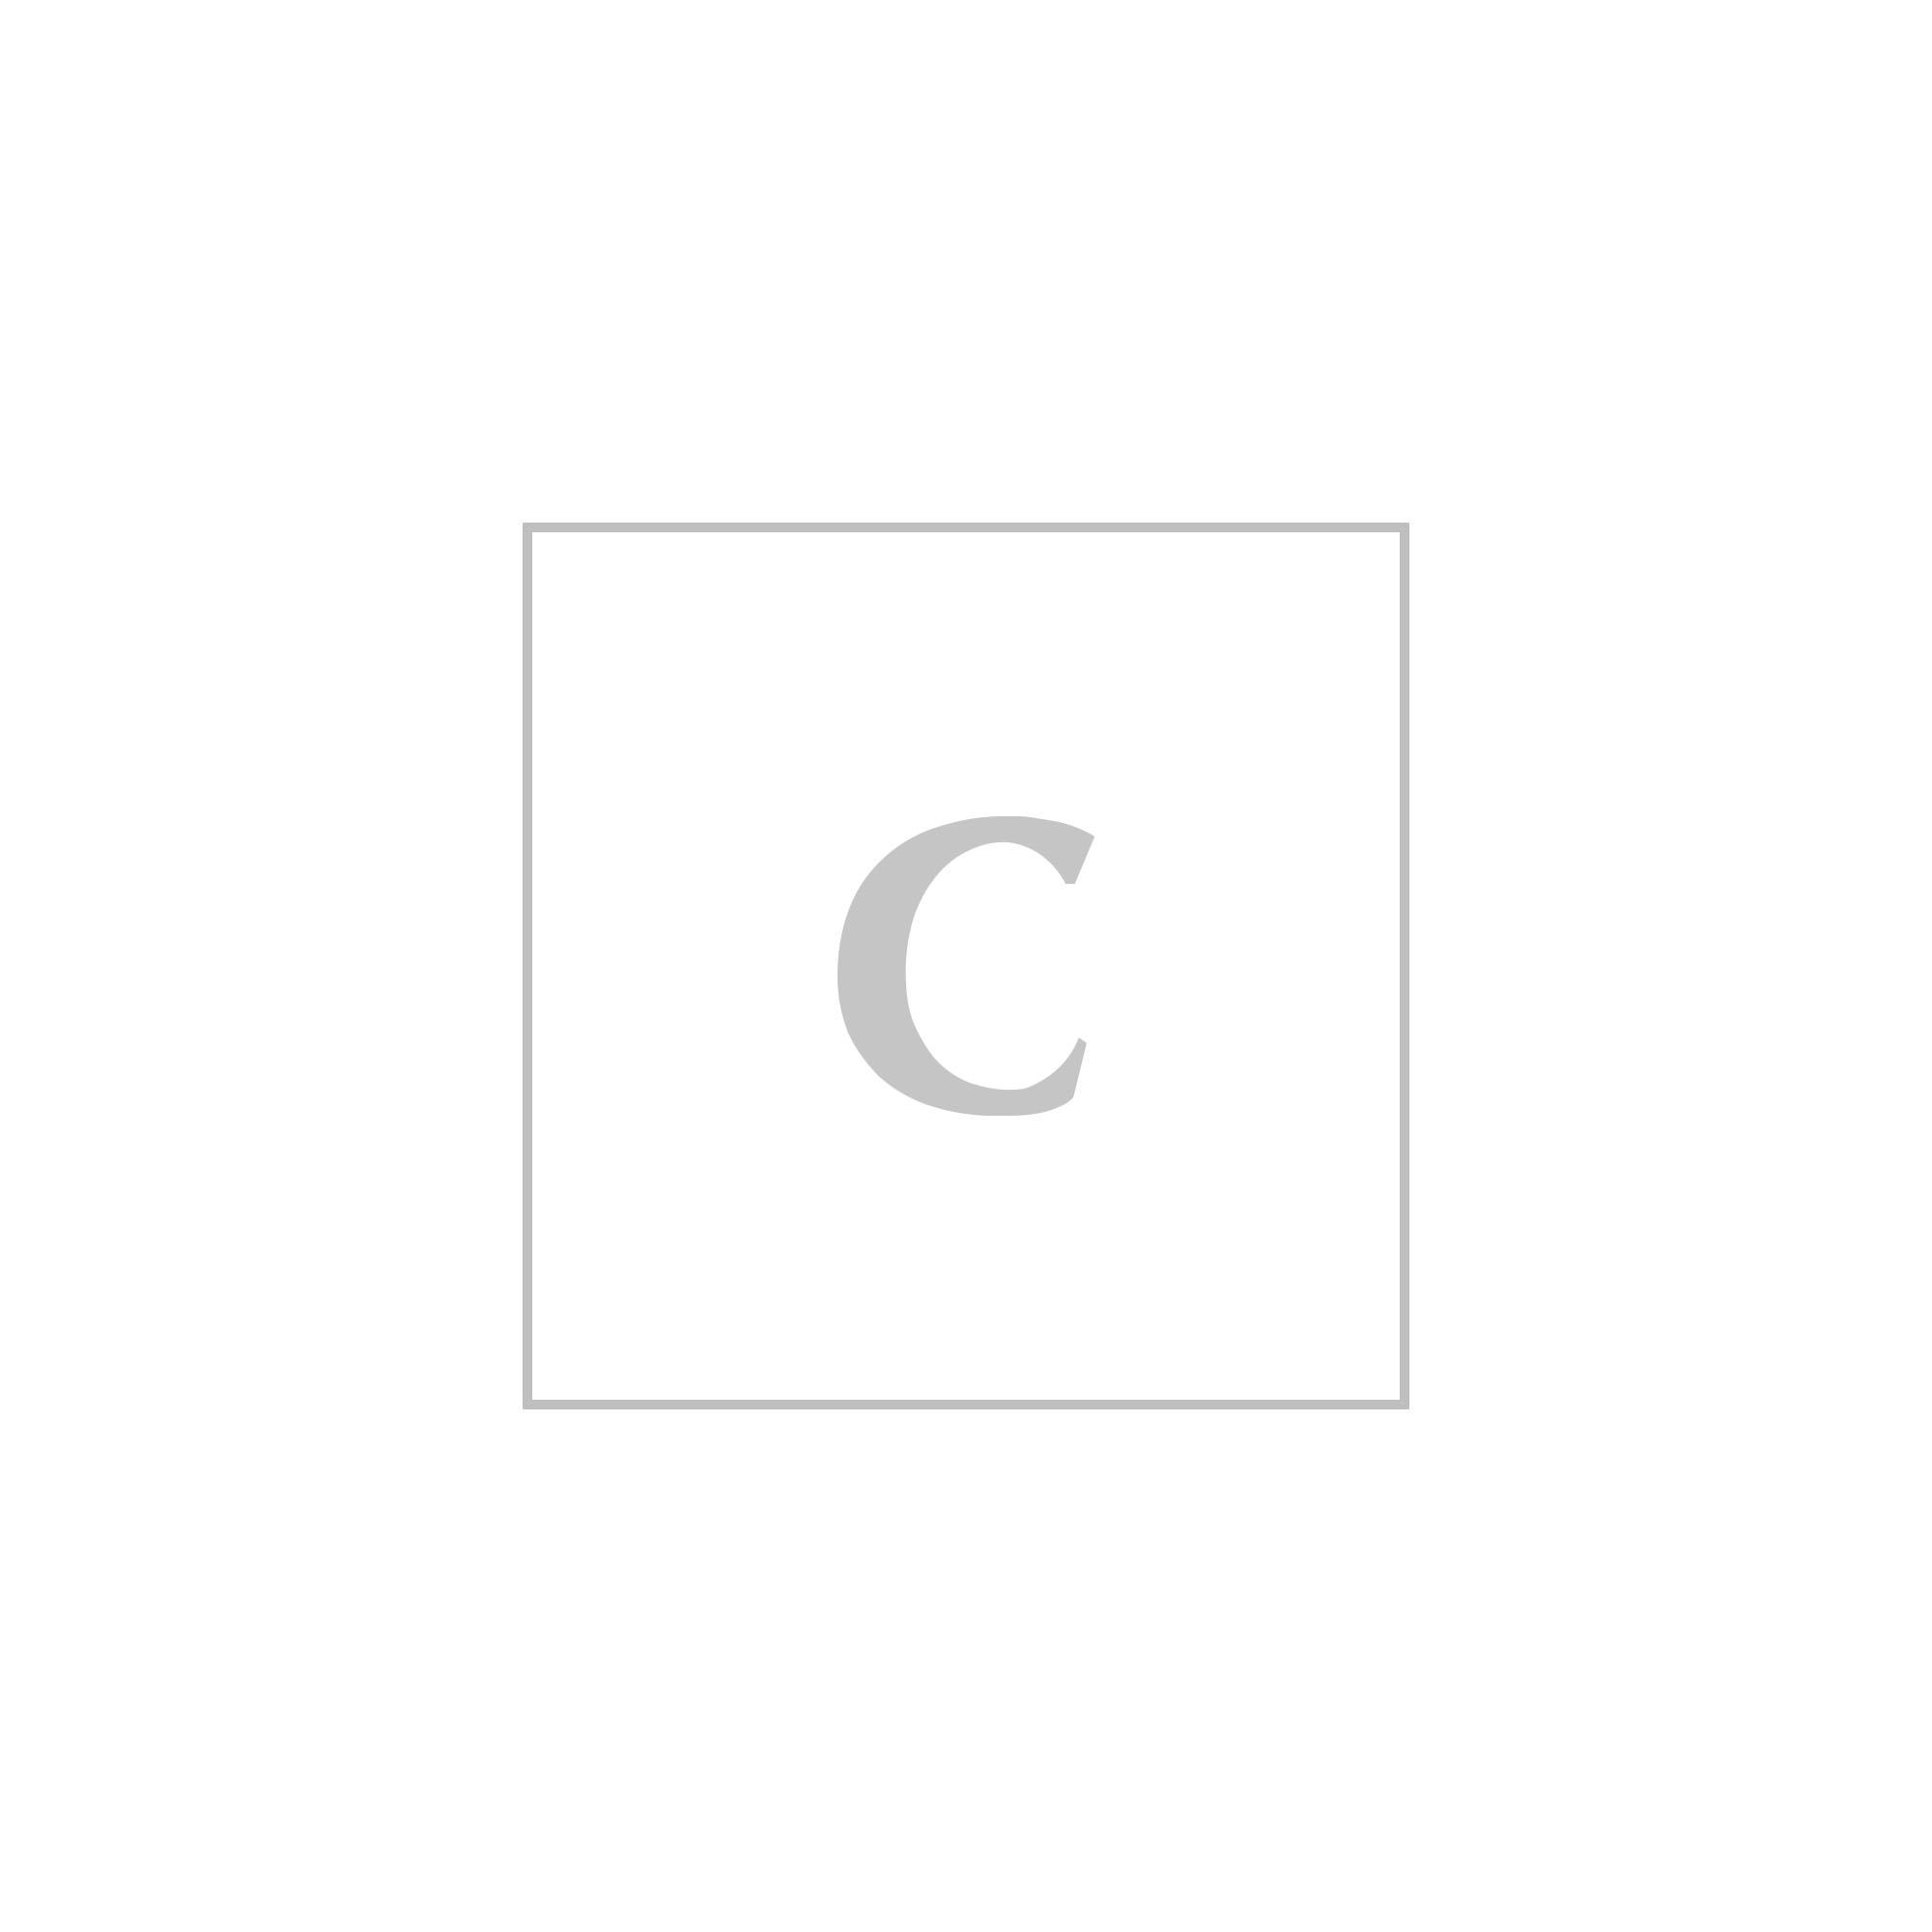 Moncler basic piumino agate